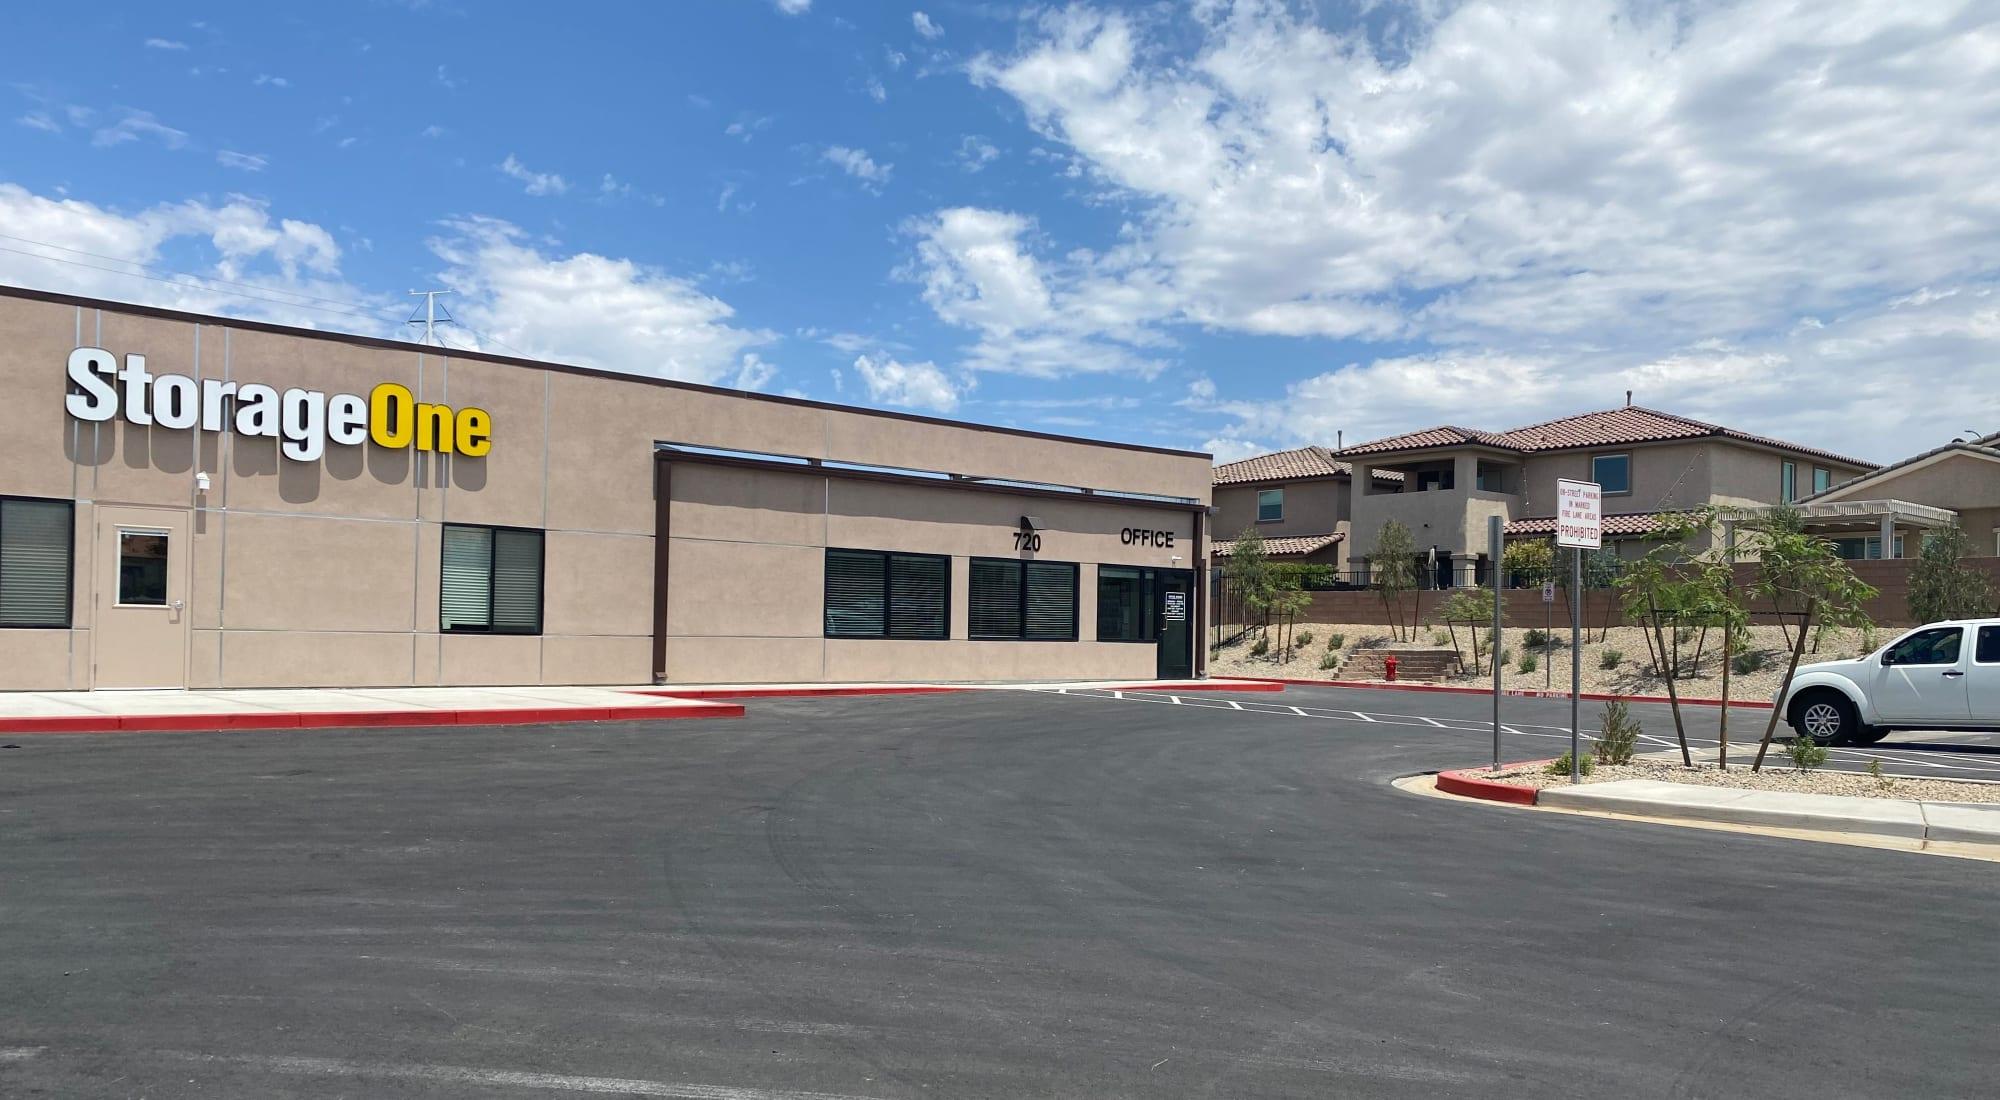 Self storage at StorageOne Horizon & Sandy Ridge in Henderson Nevada